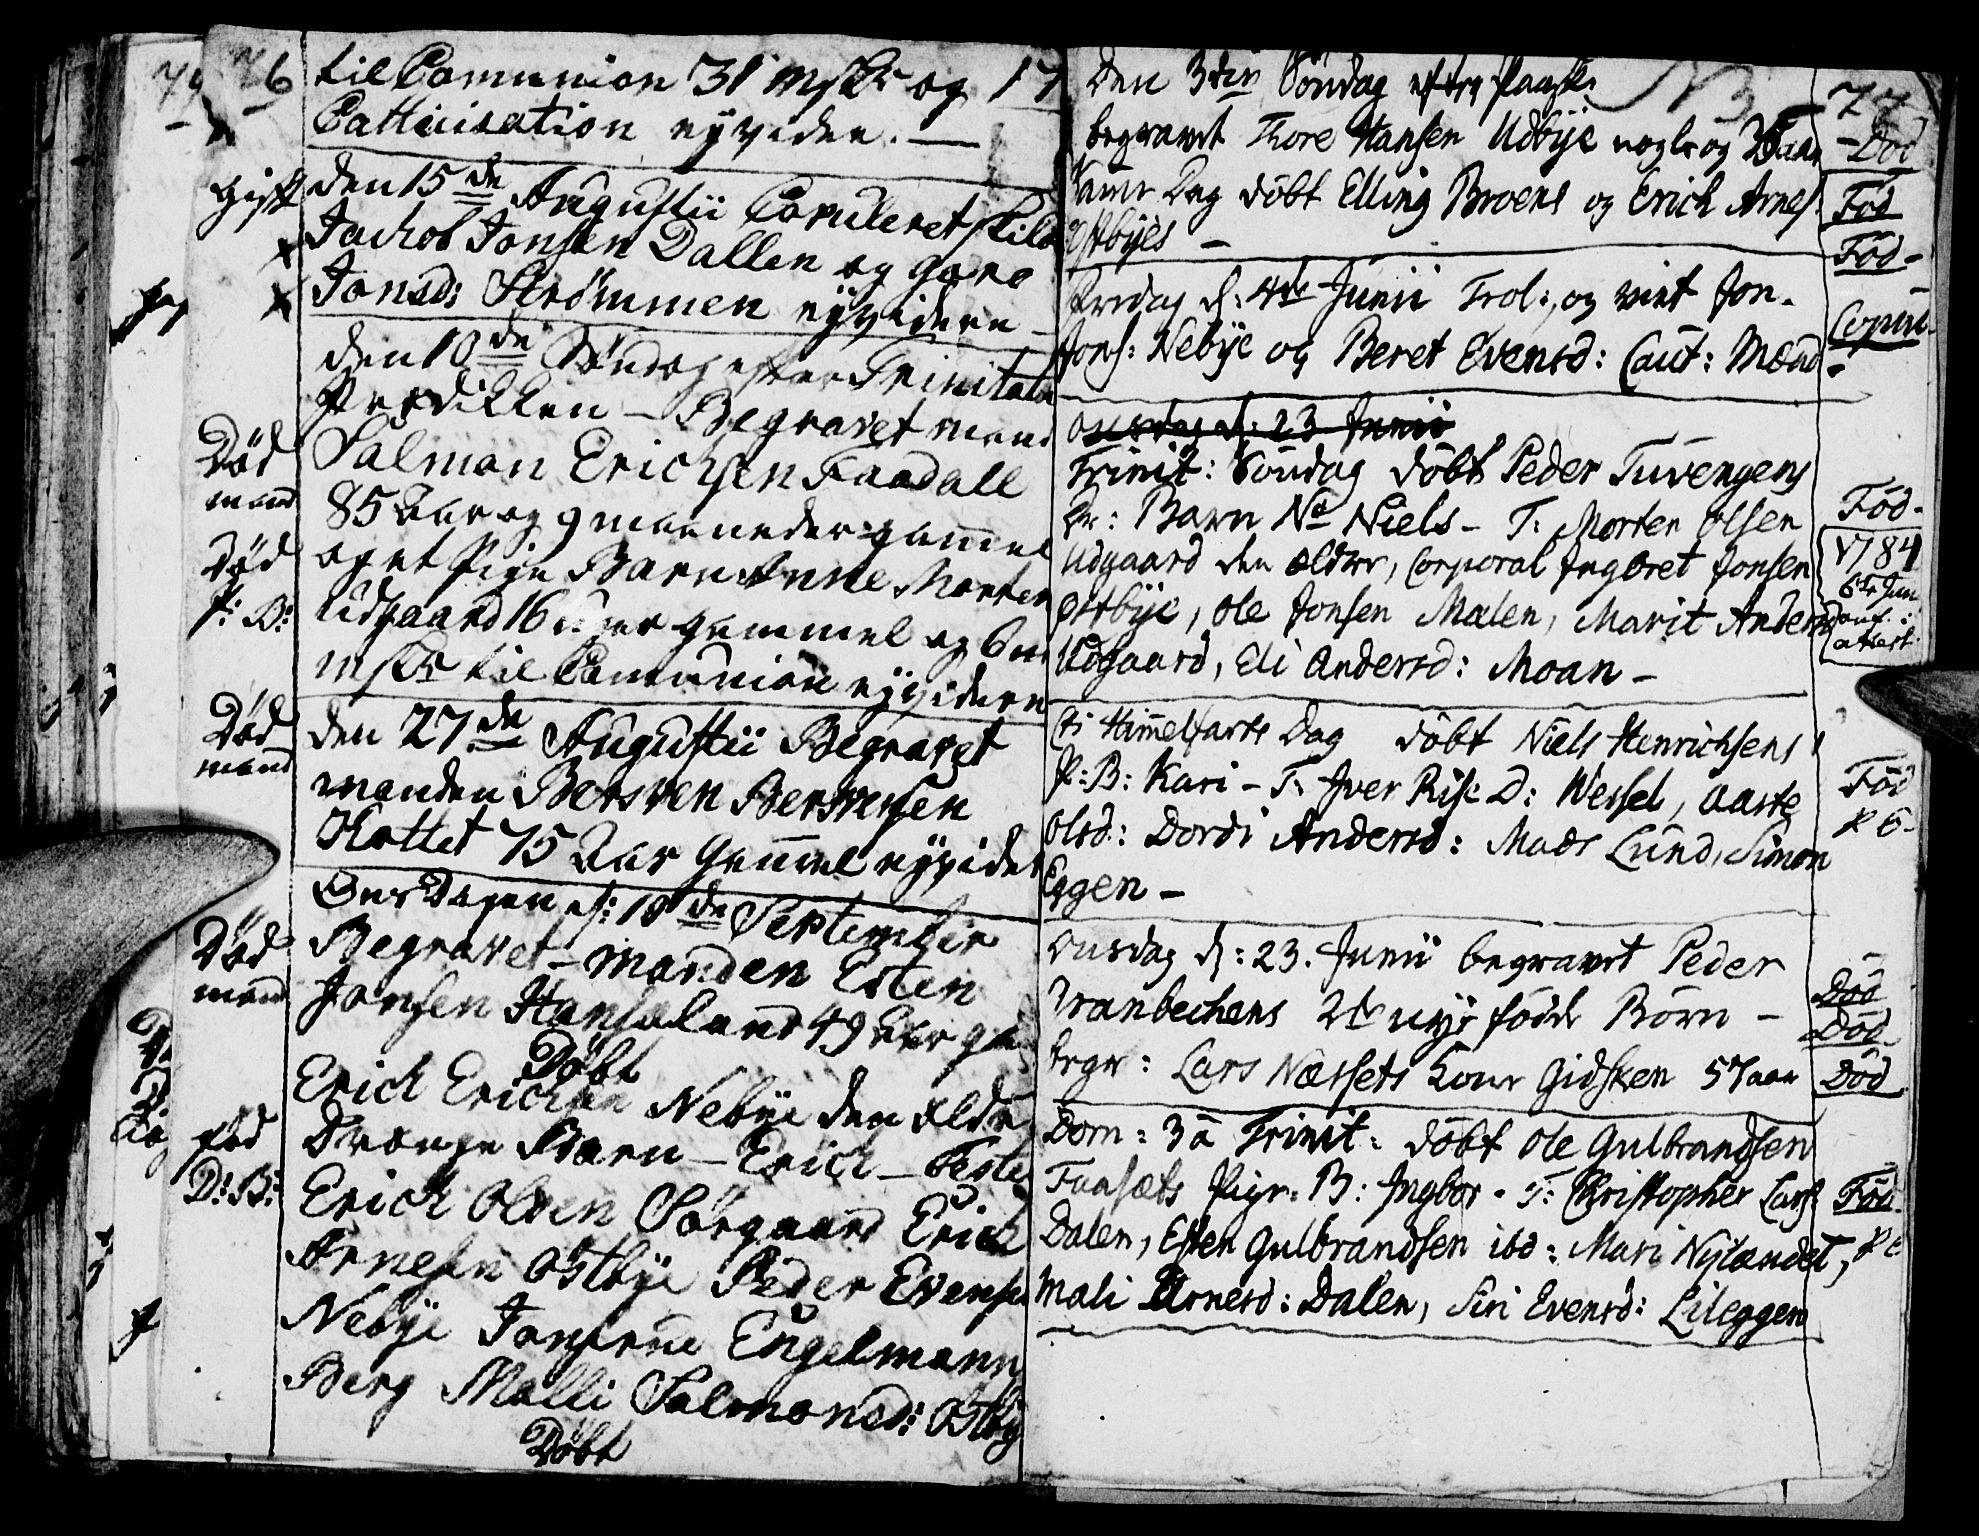 SAH, Tynset prestekontor, Ministerialbok nr. 12, 1780-1784, s. 76-77